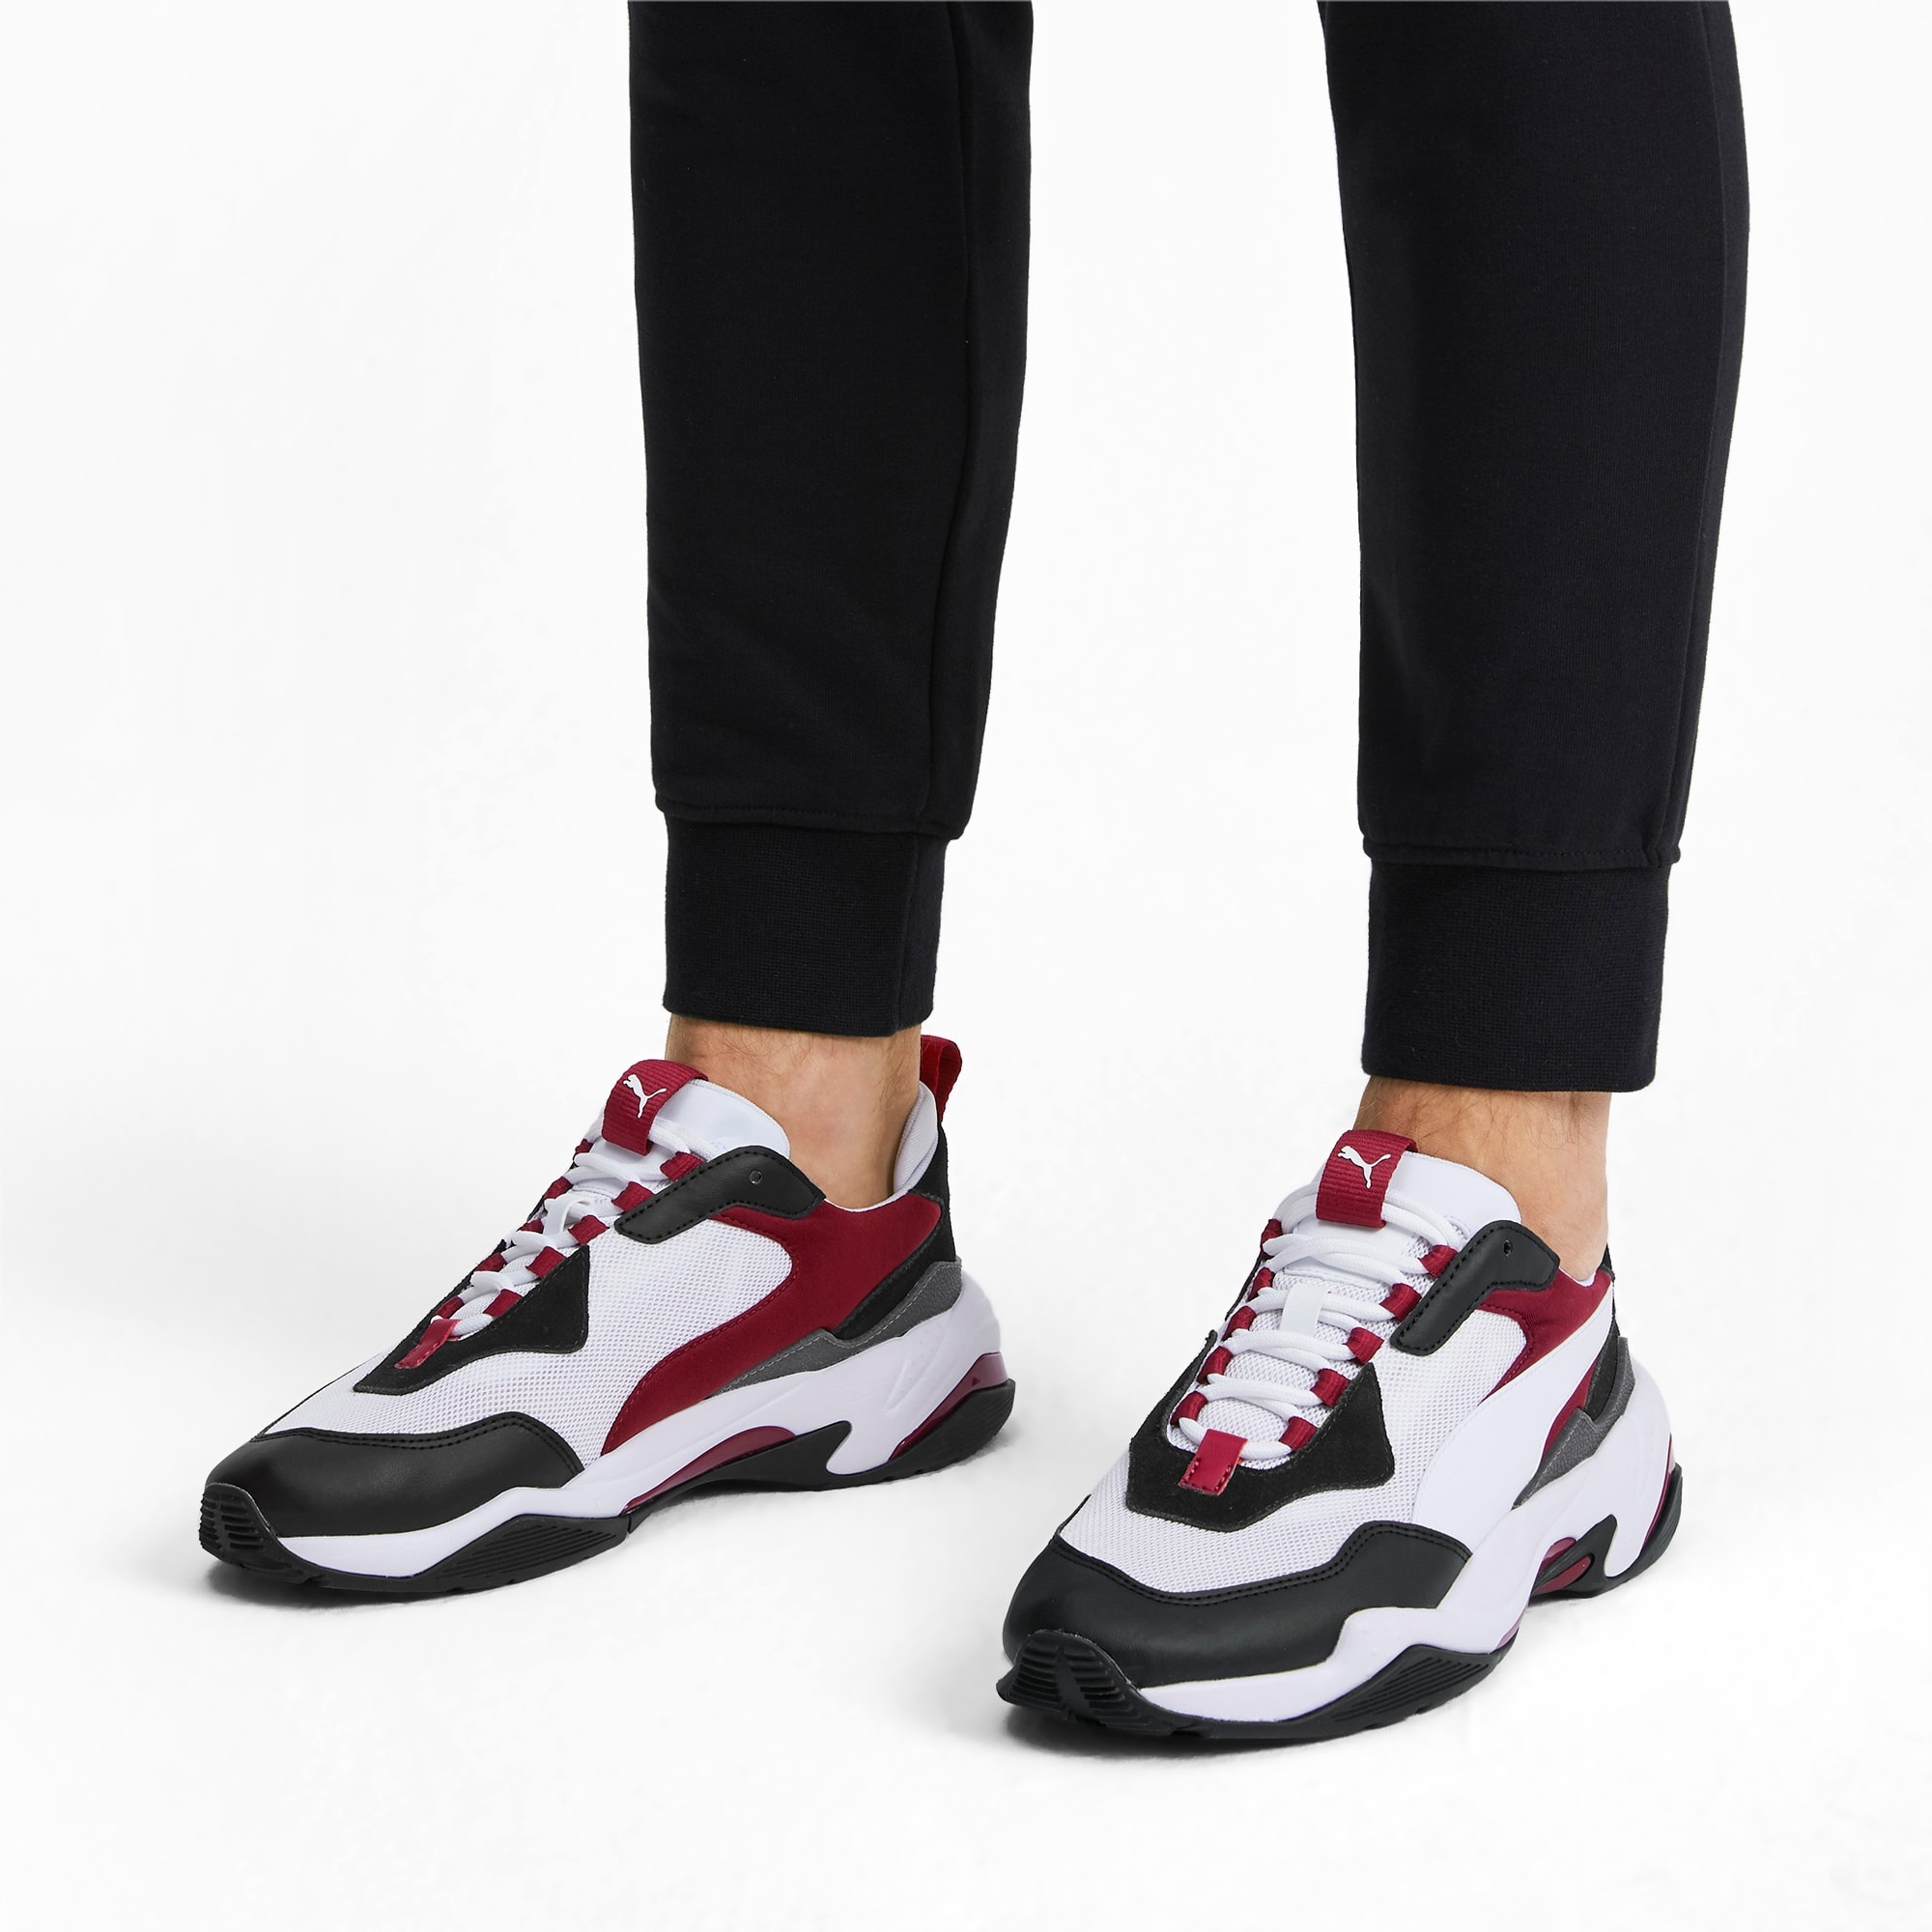 Thunder Fashion 2.0 Sneakers